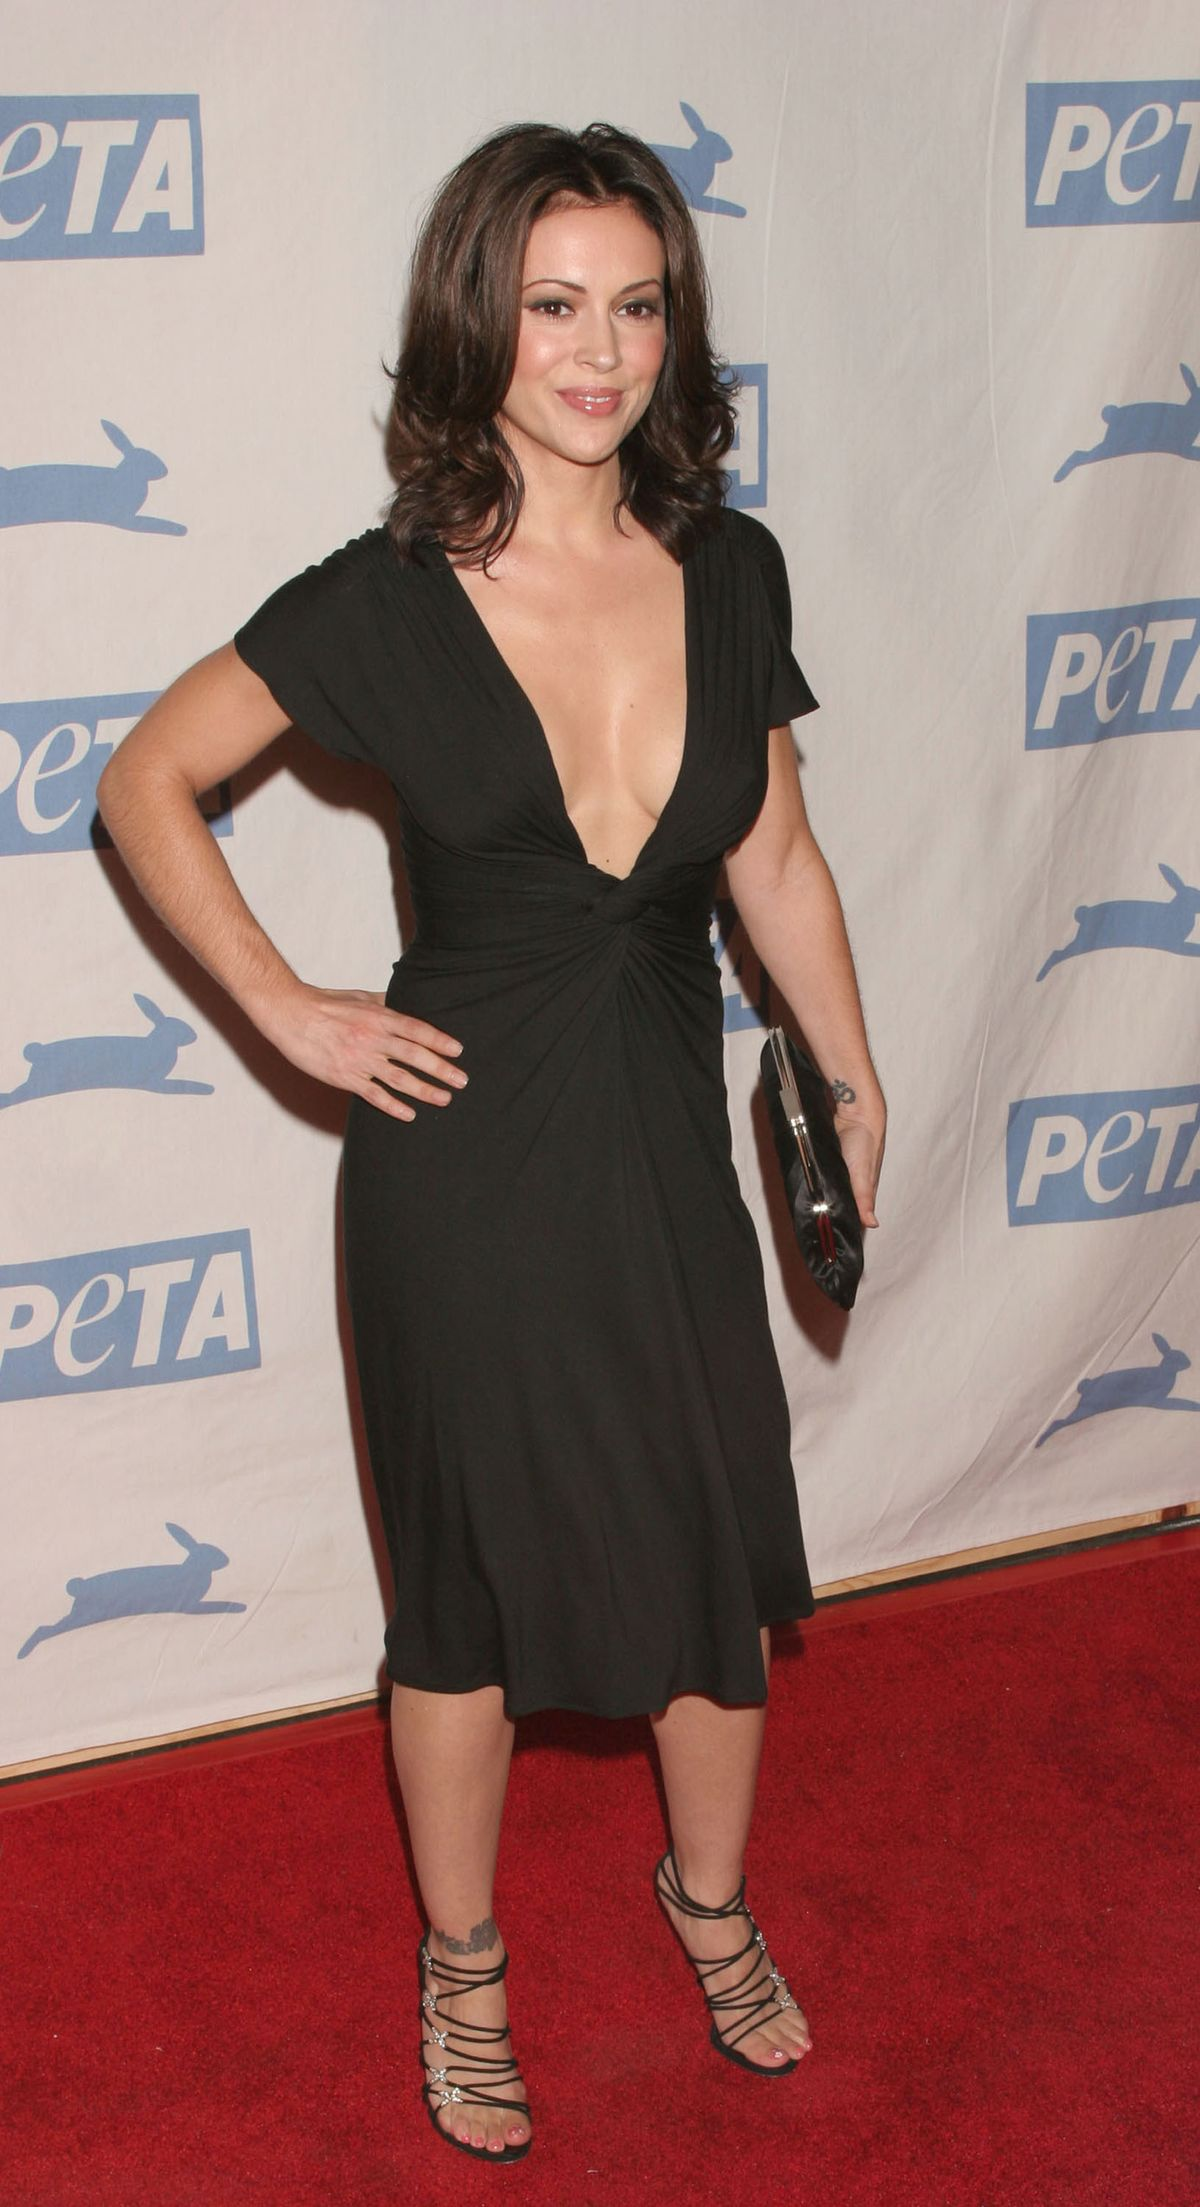 {39 Images} – Alyssa Milano at the Peta 25th Anniversary Gala and Humanitarian Awards Show at Paramount Pictures Studio in Hollywood, CA September 10 2005